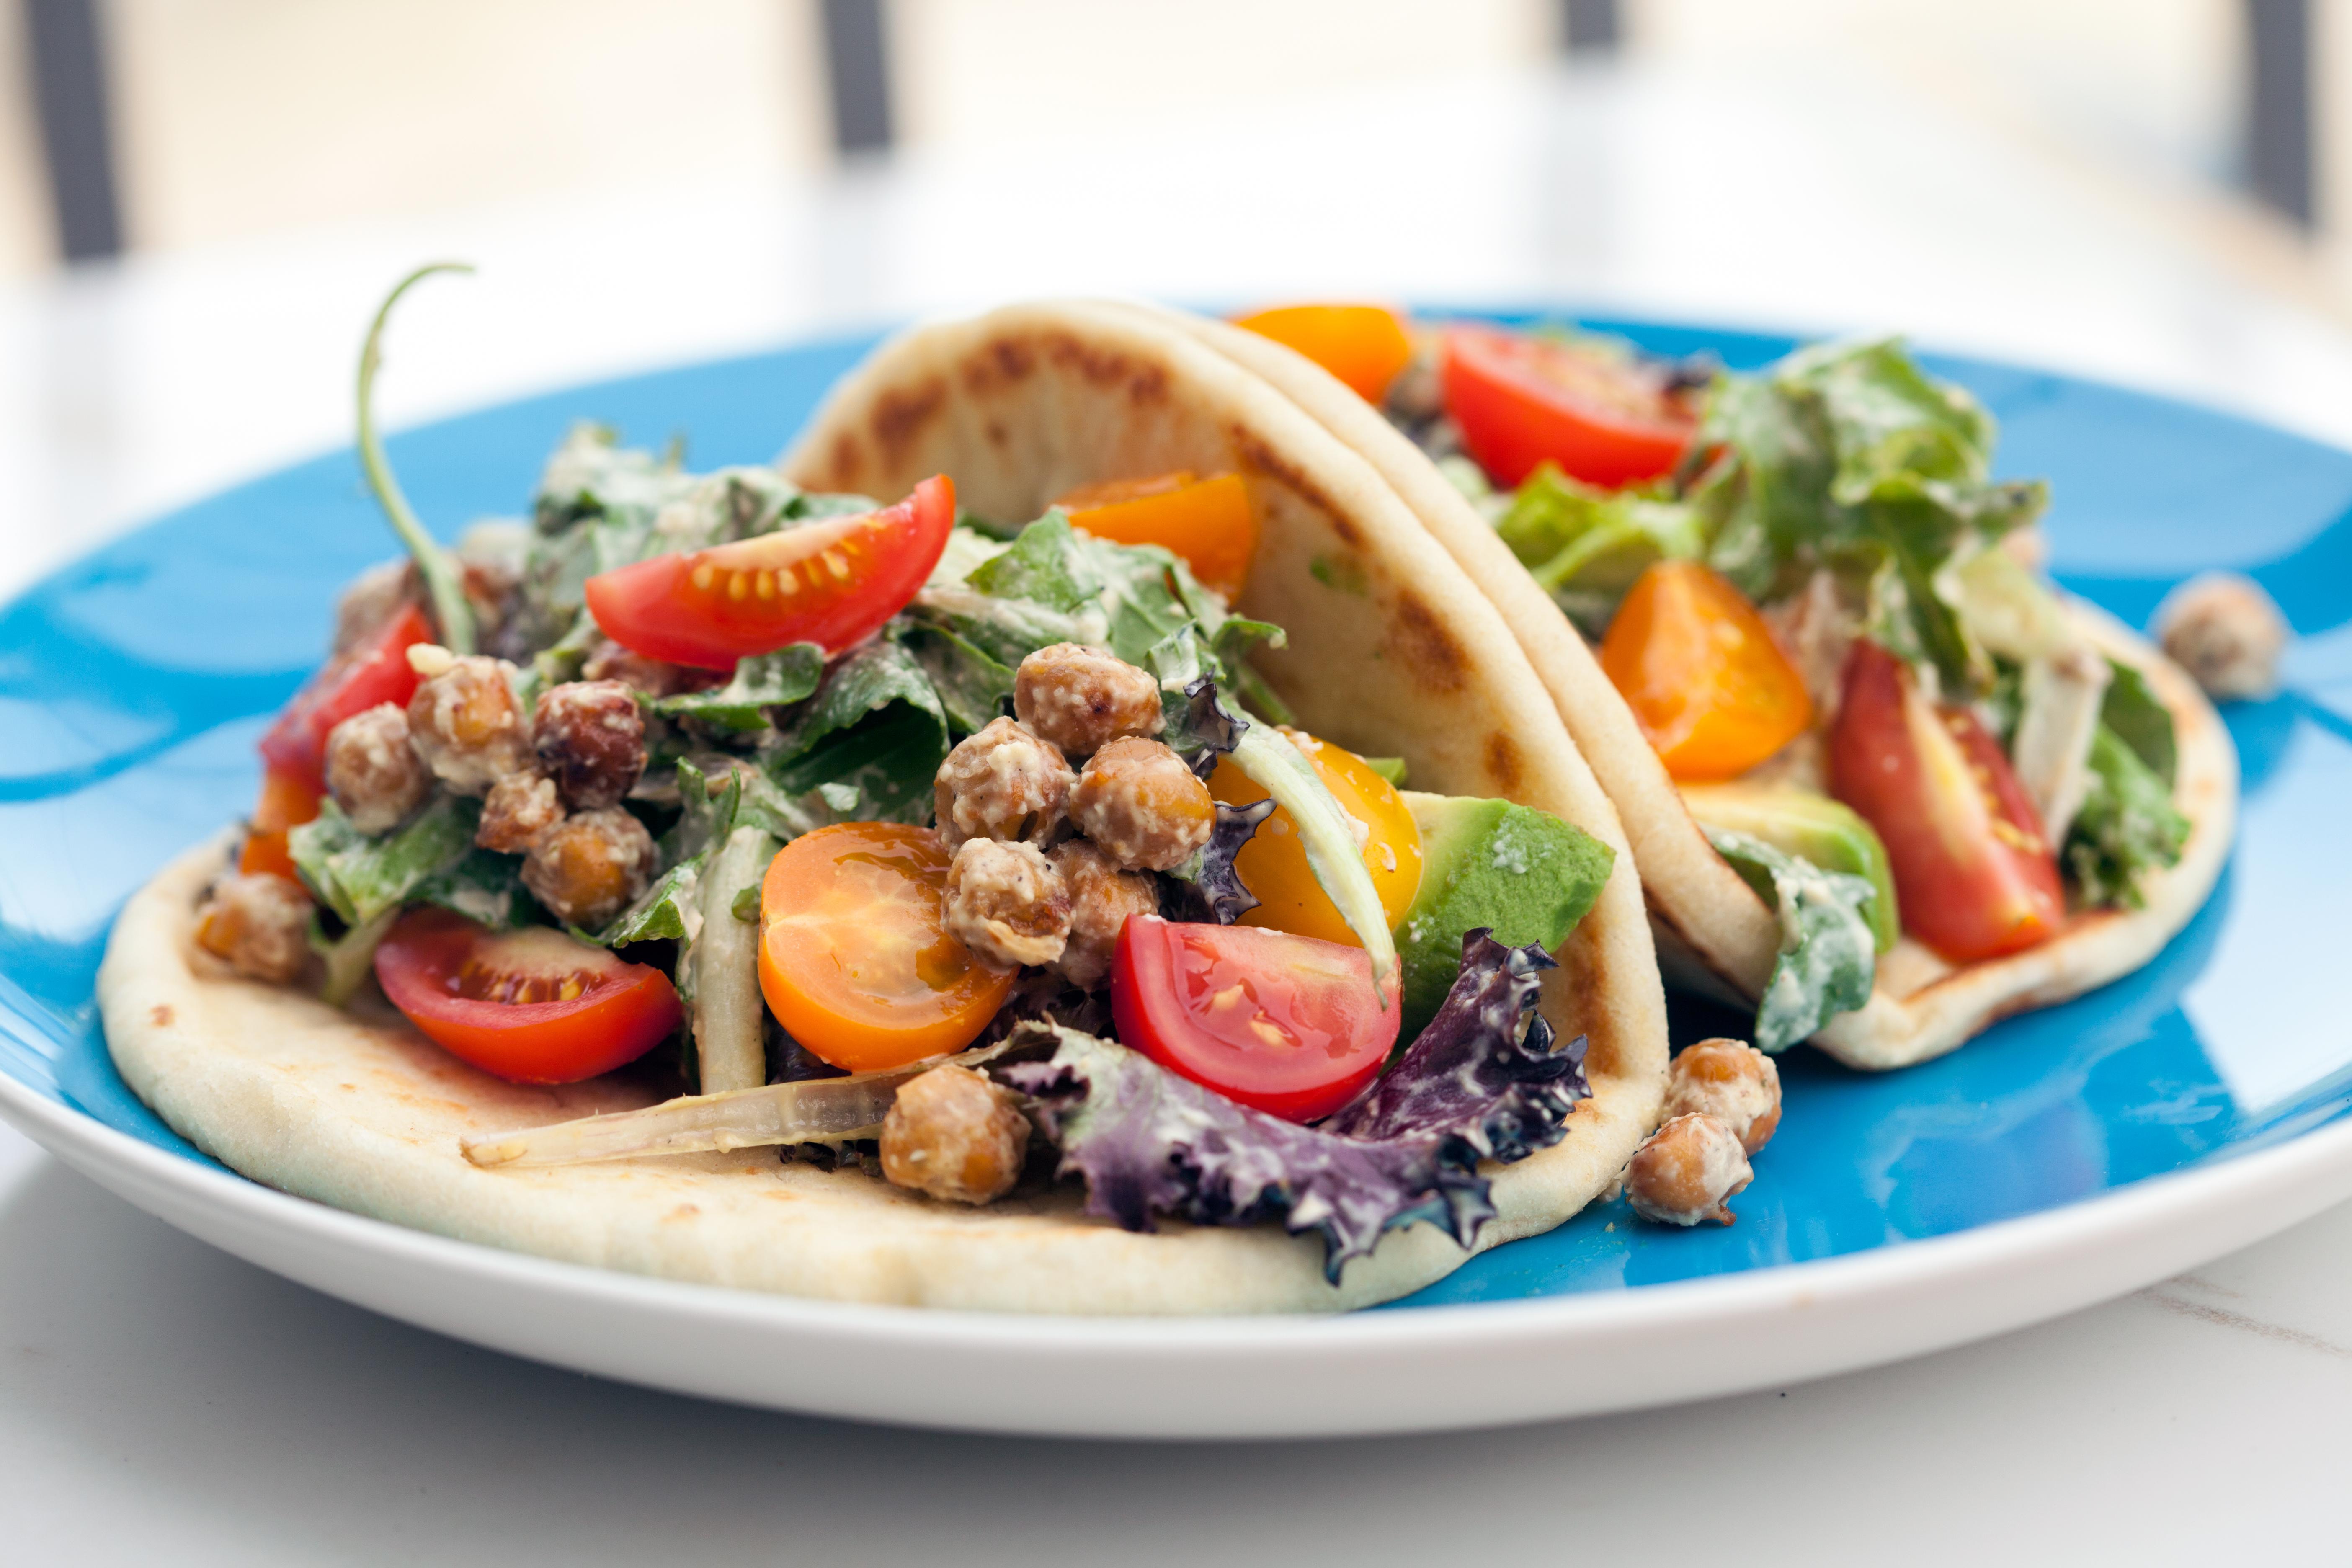 A crazy tasty #vegan caesar dressing, crunchy spiced chickpeas, creamy avocado, and sweet tomatoes make for an incredible lunch option! | spachethespatula.com #recipe